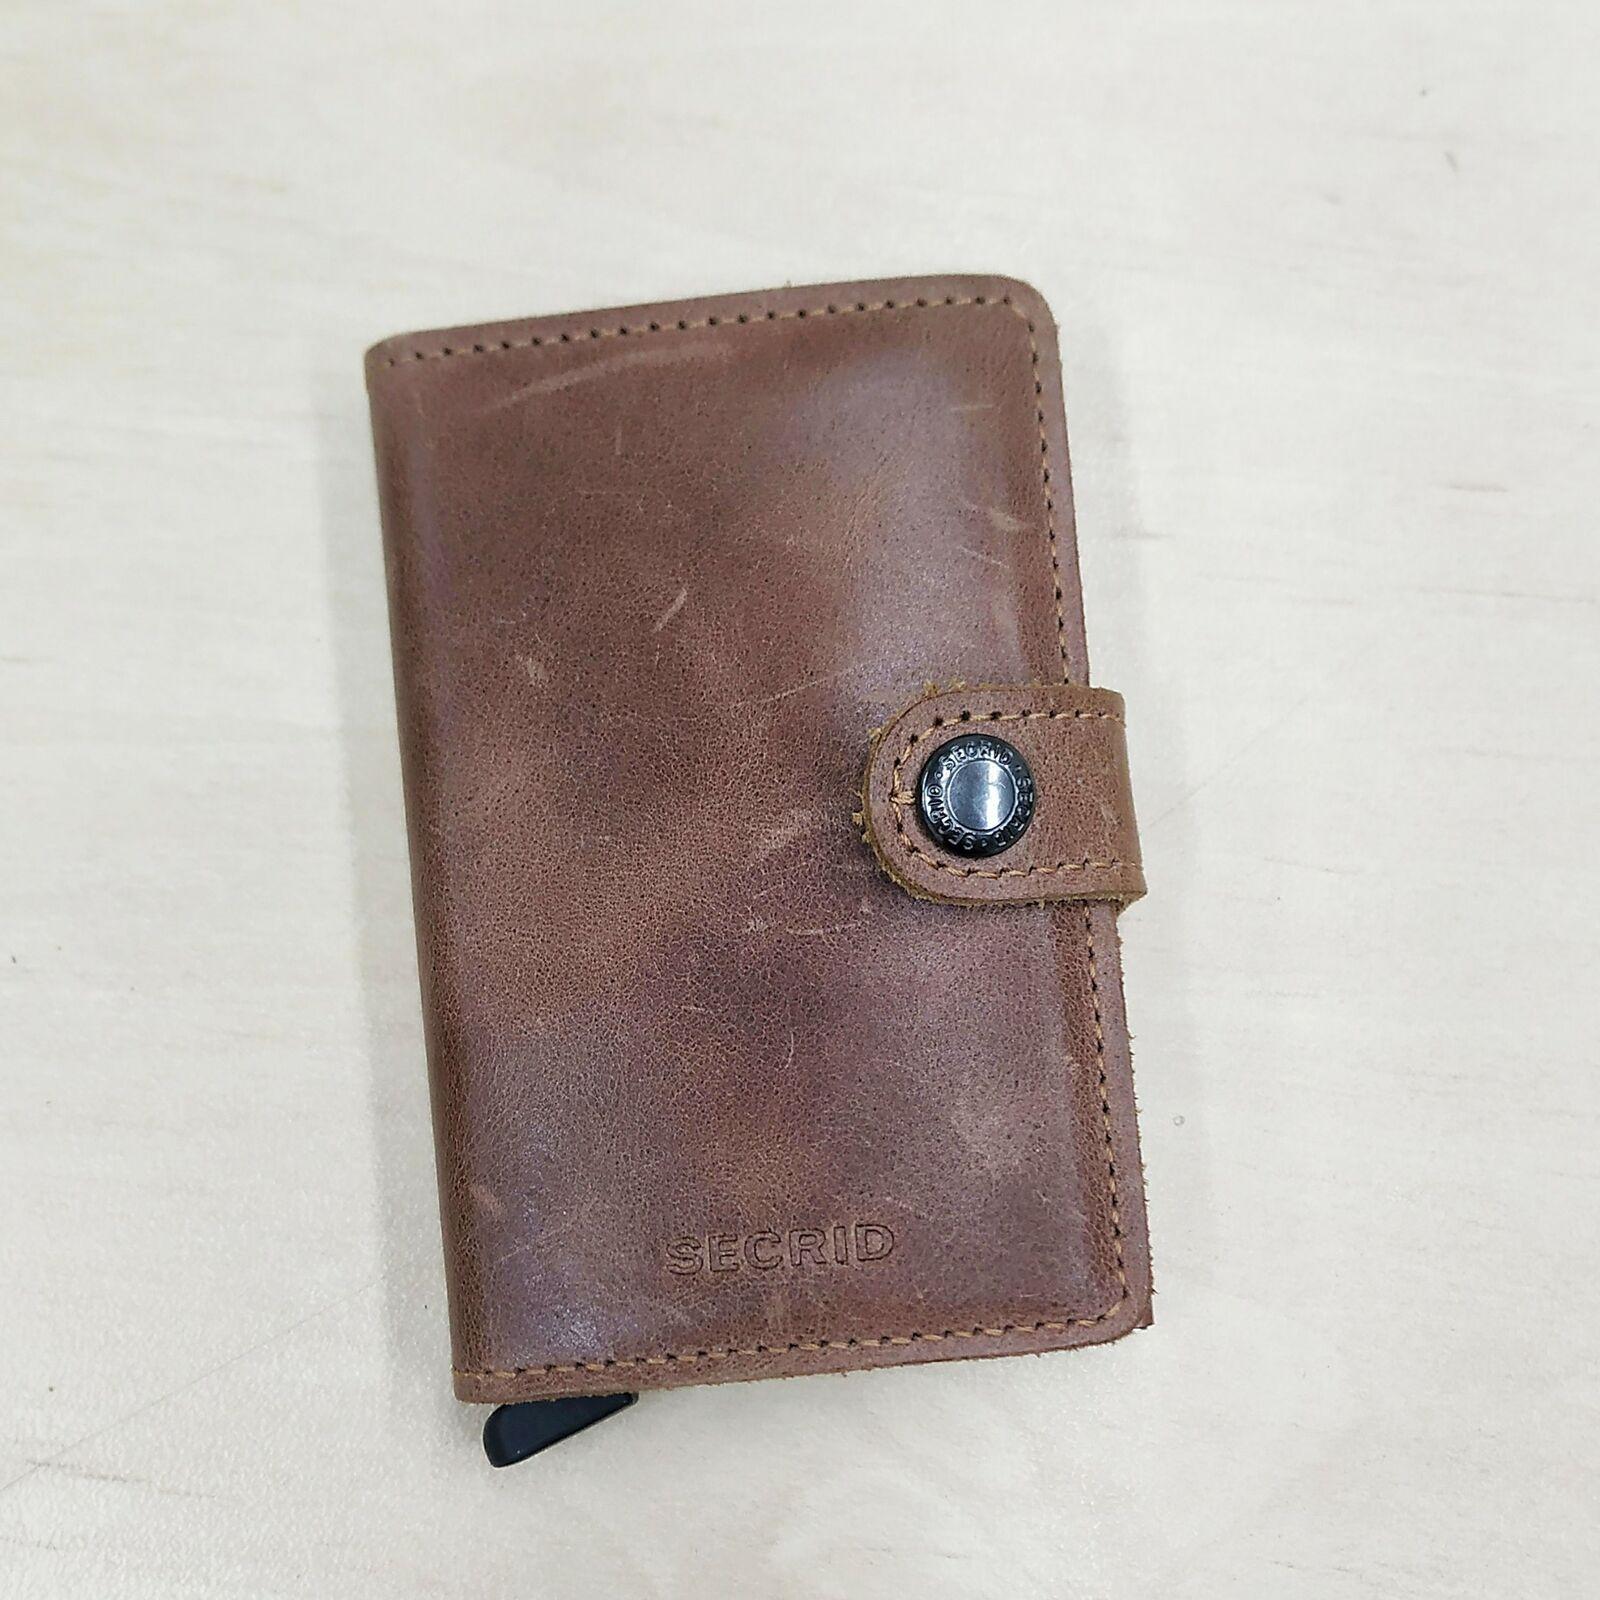 Secrid Mini Wallet Genuine Leather Cognac Rust RFID Safe Card Case 12 Card